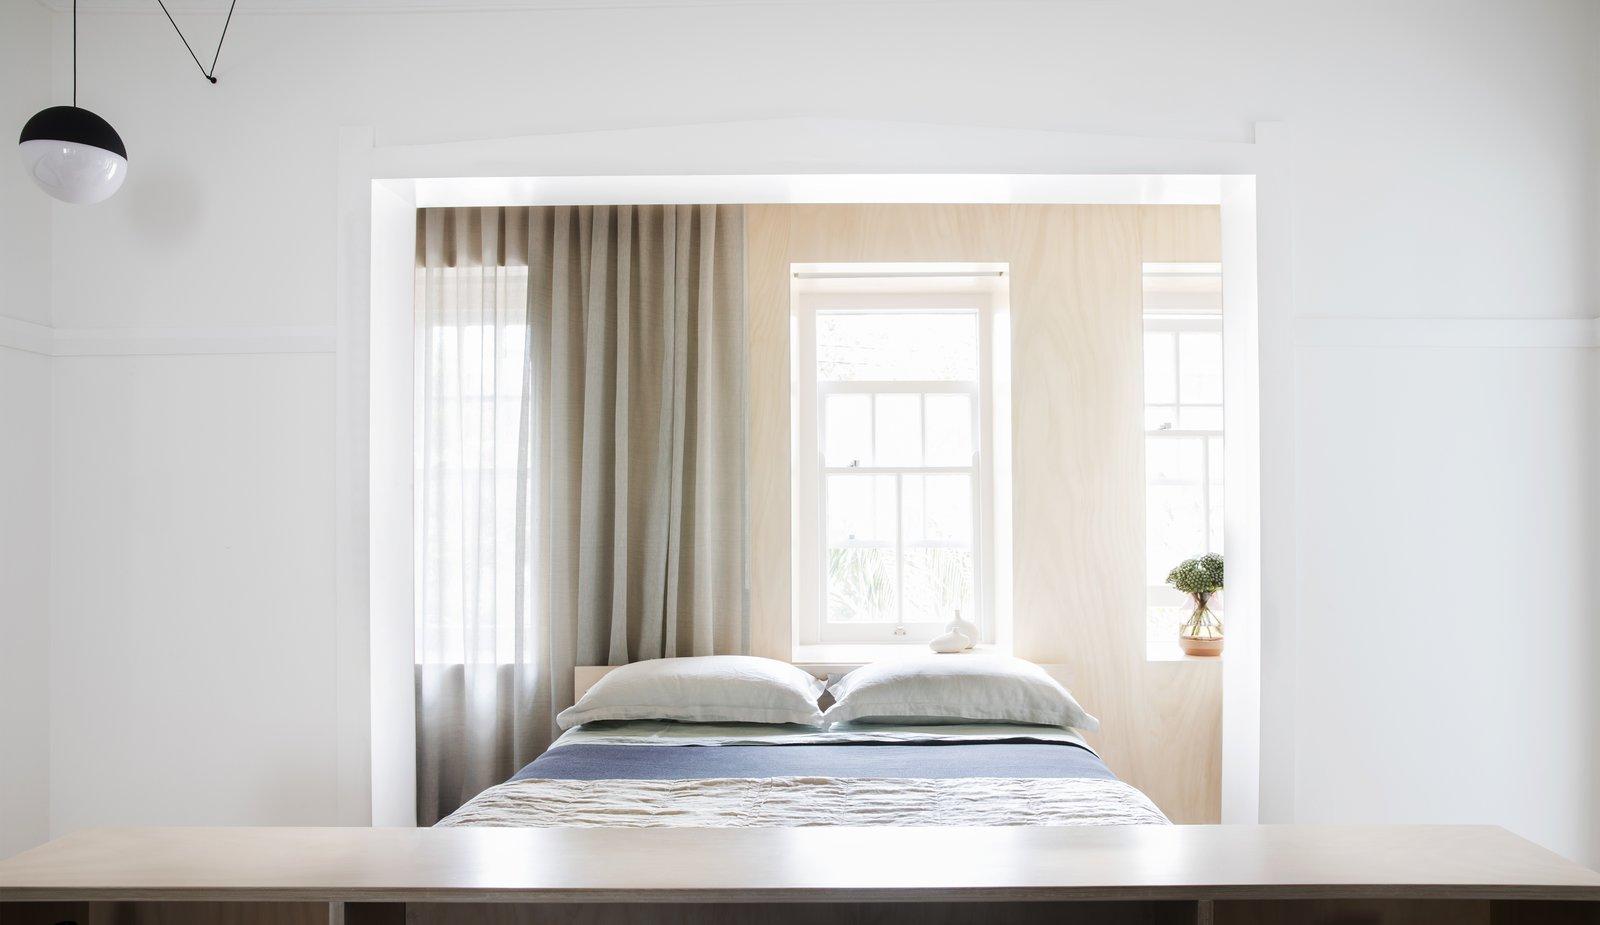 Tagged: Bedroom. Nano Pad by Leibal